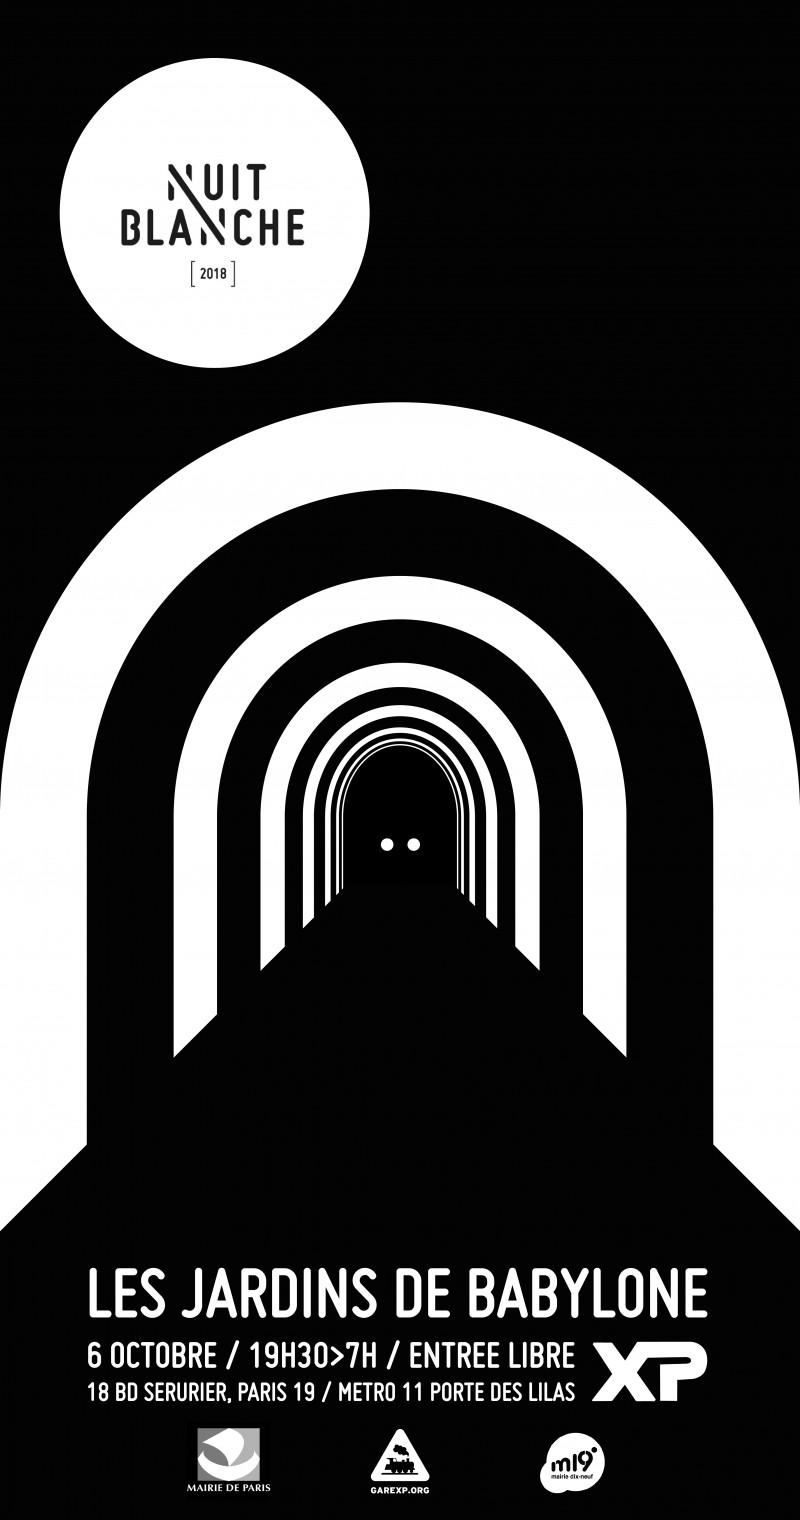 affiche-nuit-blanche-2018-gare-xp-990a5bd759fd67aa9bbf40e2dc4933ca